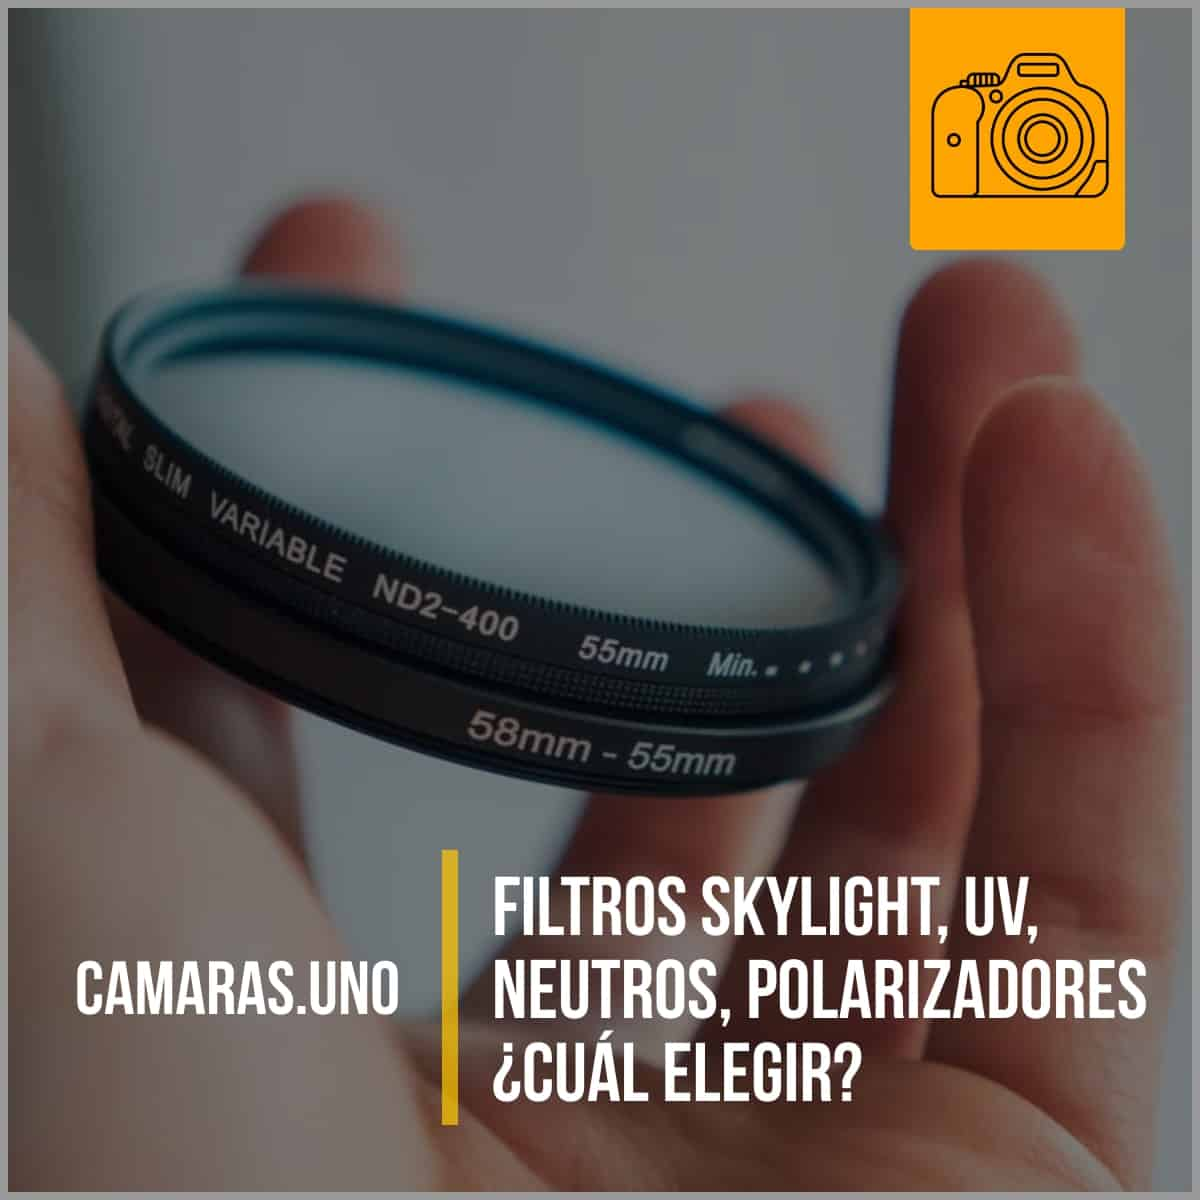 Filtros Skylight, UV, neutros, polarizadores ¿Cuál elegir?